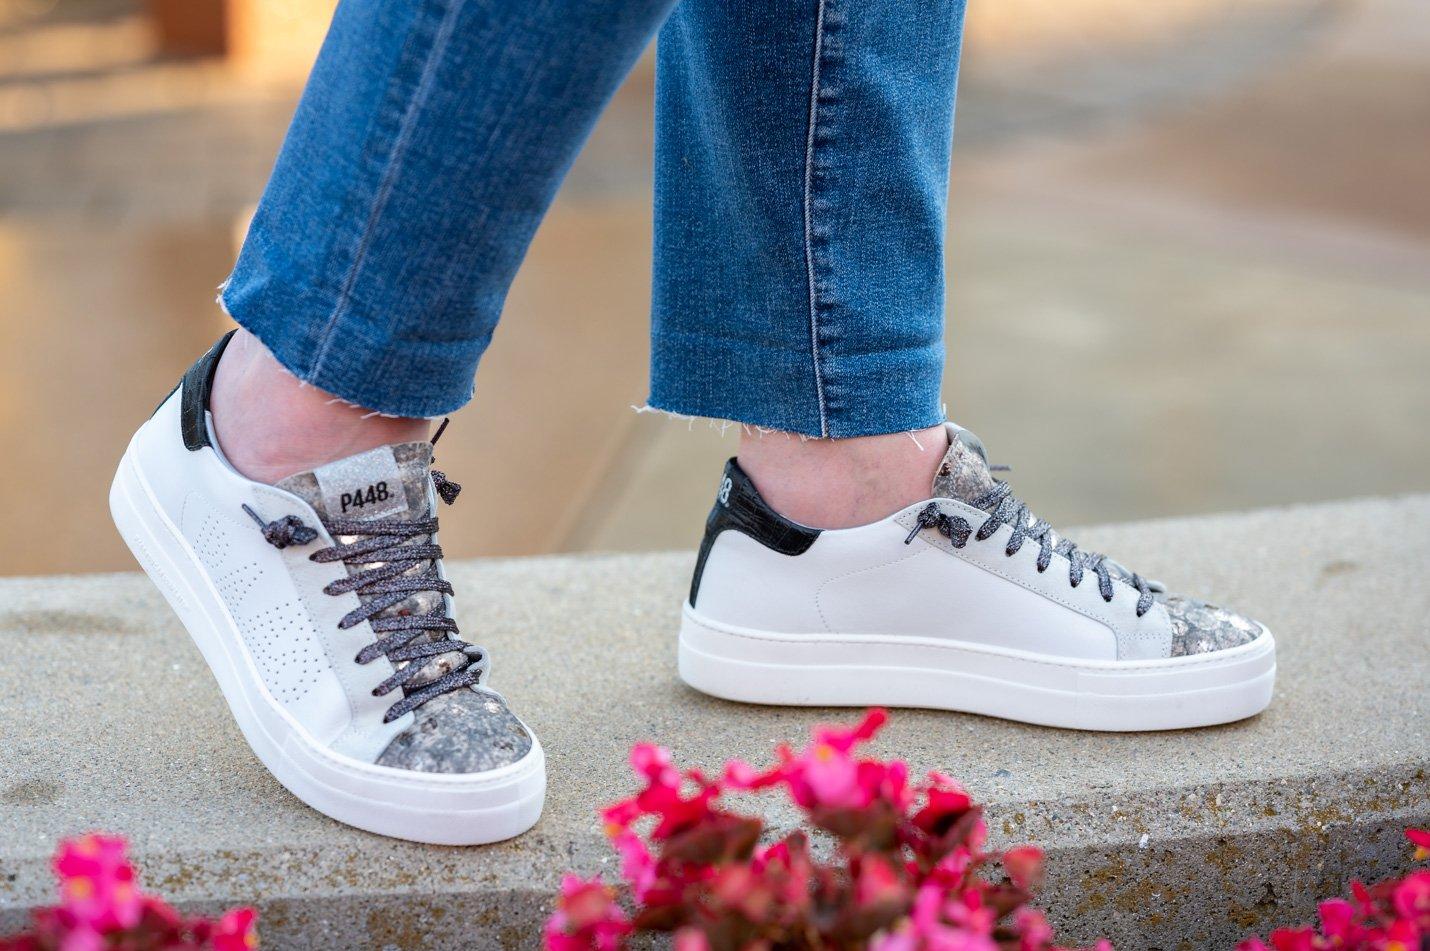 Jazzed Sneakers